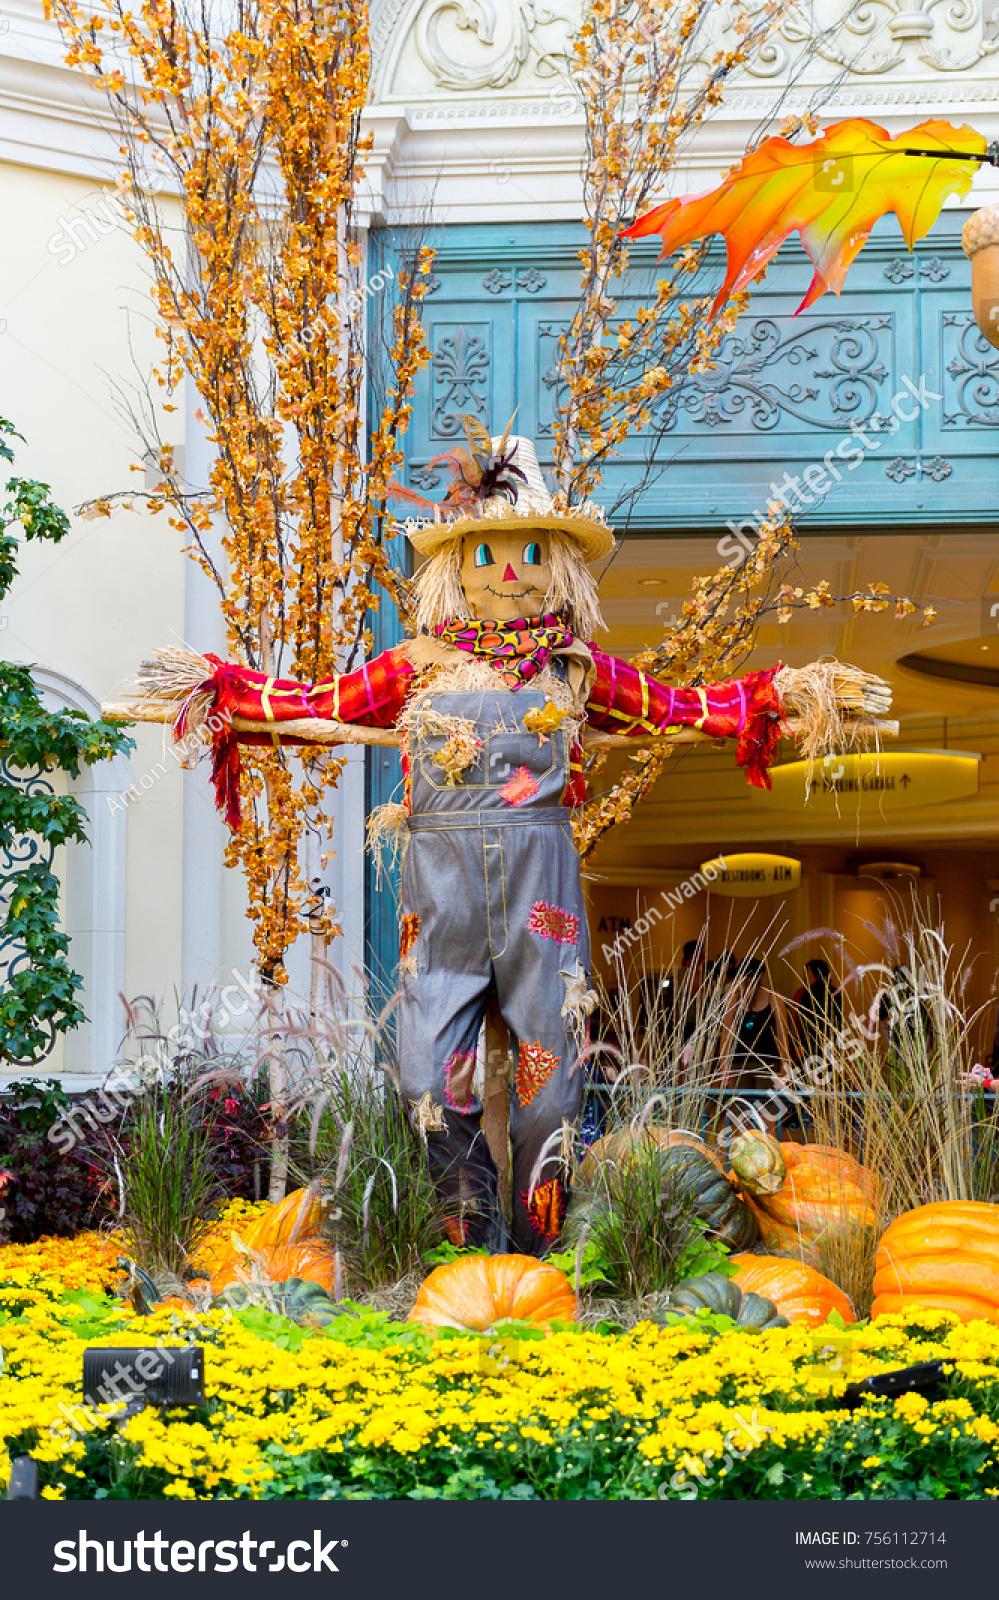 Las vegas usa sep 21 2017 stock photo edit now 756112714 las vegas usa sep 21 2017 scarecrow in conservatory in bellagio izmirmasajfo